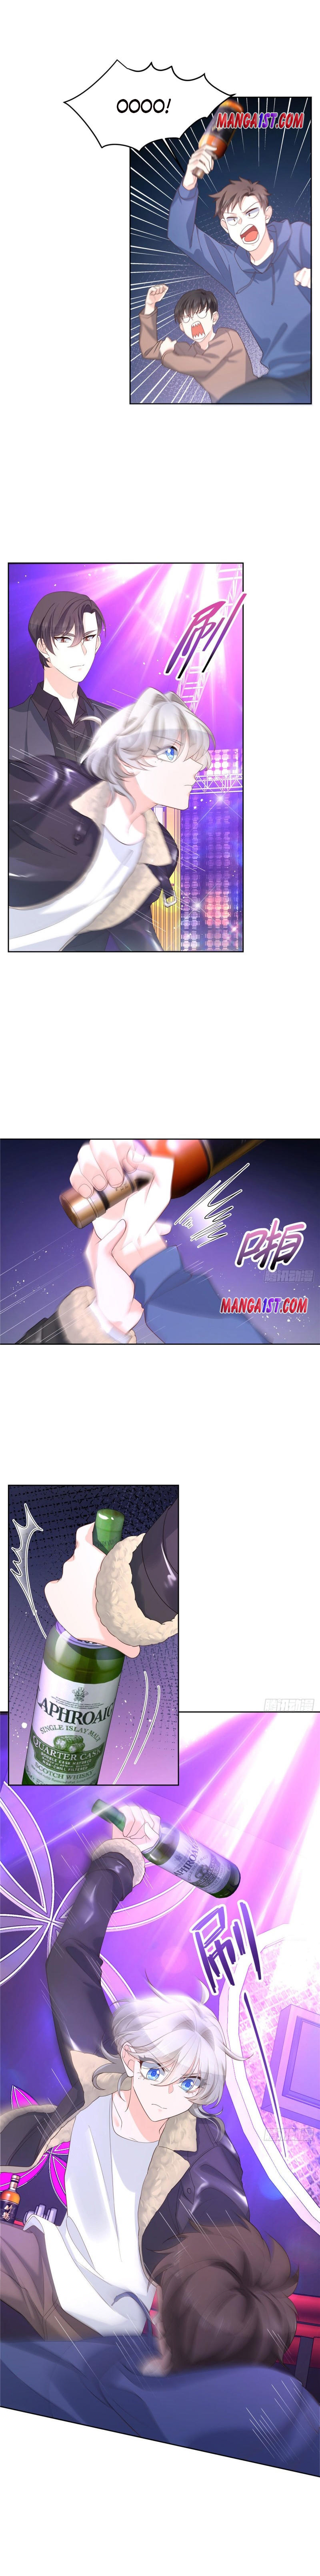 National School Prince Is A Girl Chapter 148 page 1 - Mangakakalots.com